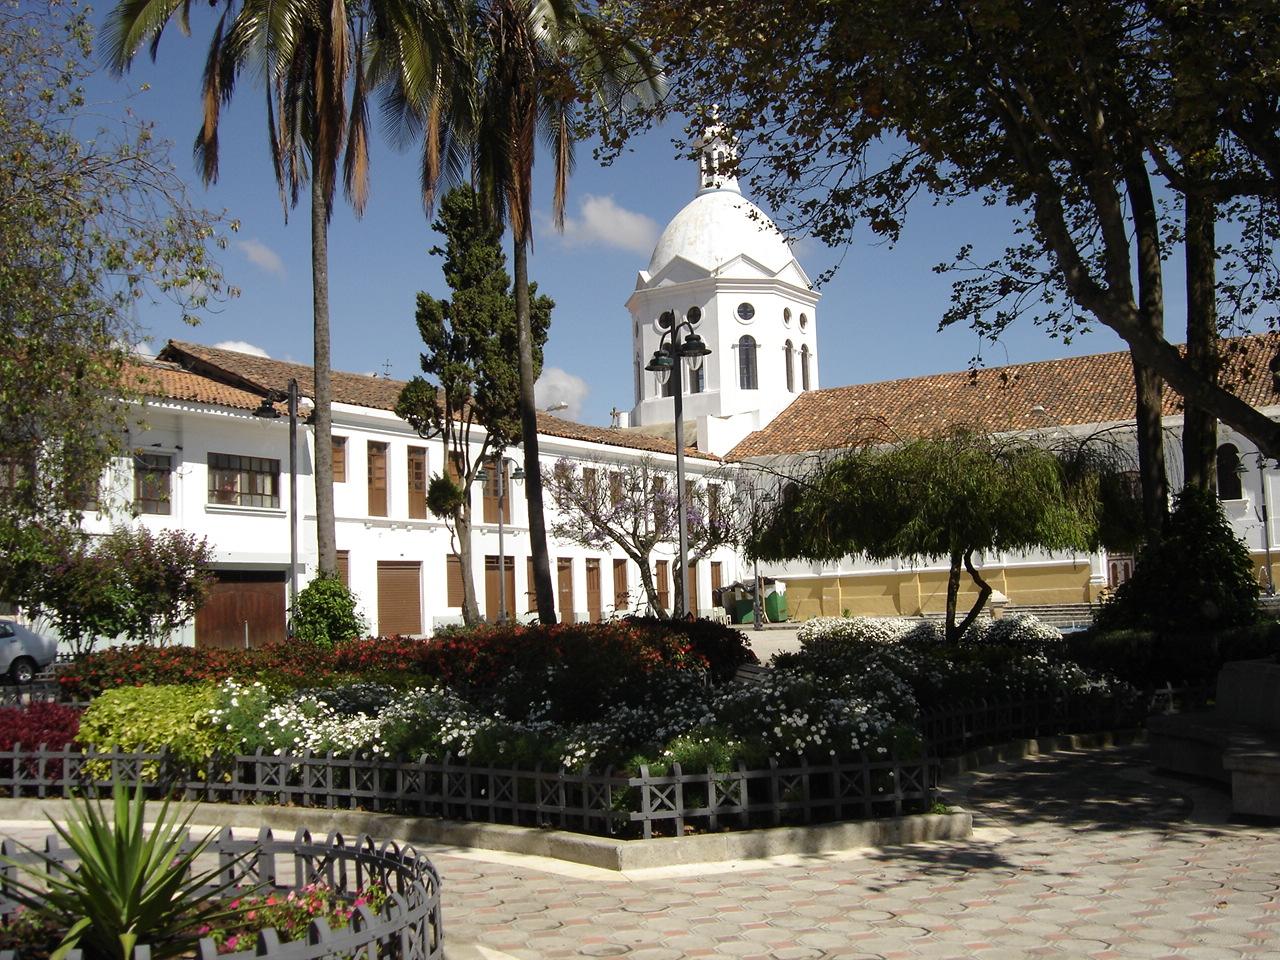 Rundreise - Cuenca-Plaza-San-Sebastián-by-Ryan-Whisner-November-2006.jpg